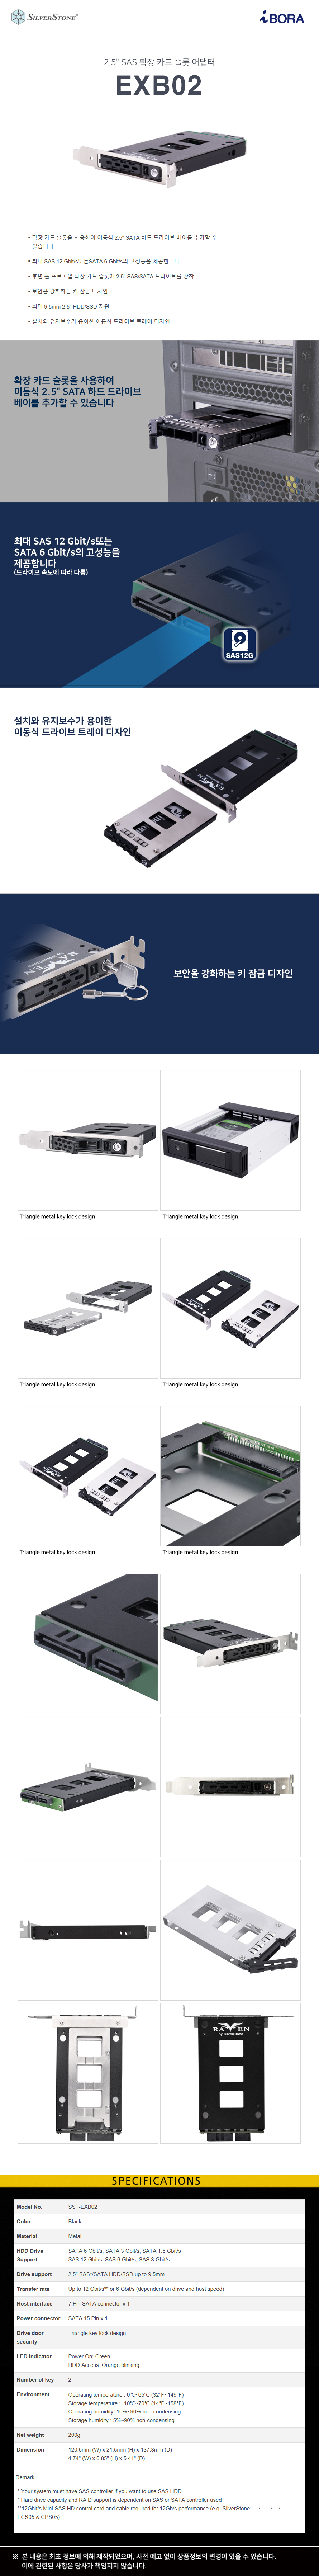 SilverStone SST-EXB02 2.5인치 SAS 확장 카드 슬롯 (하드미포함)